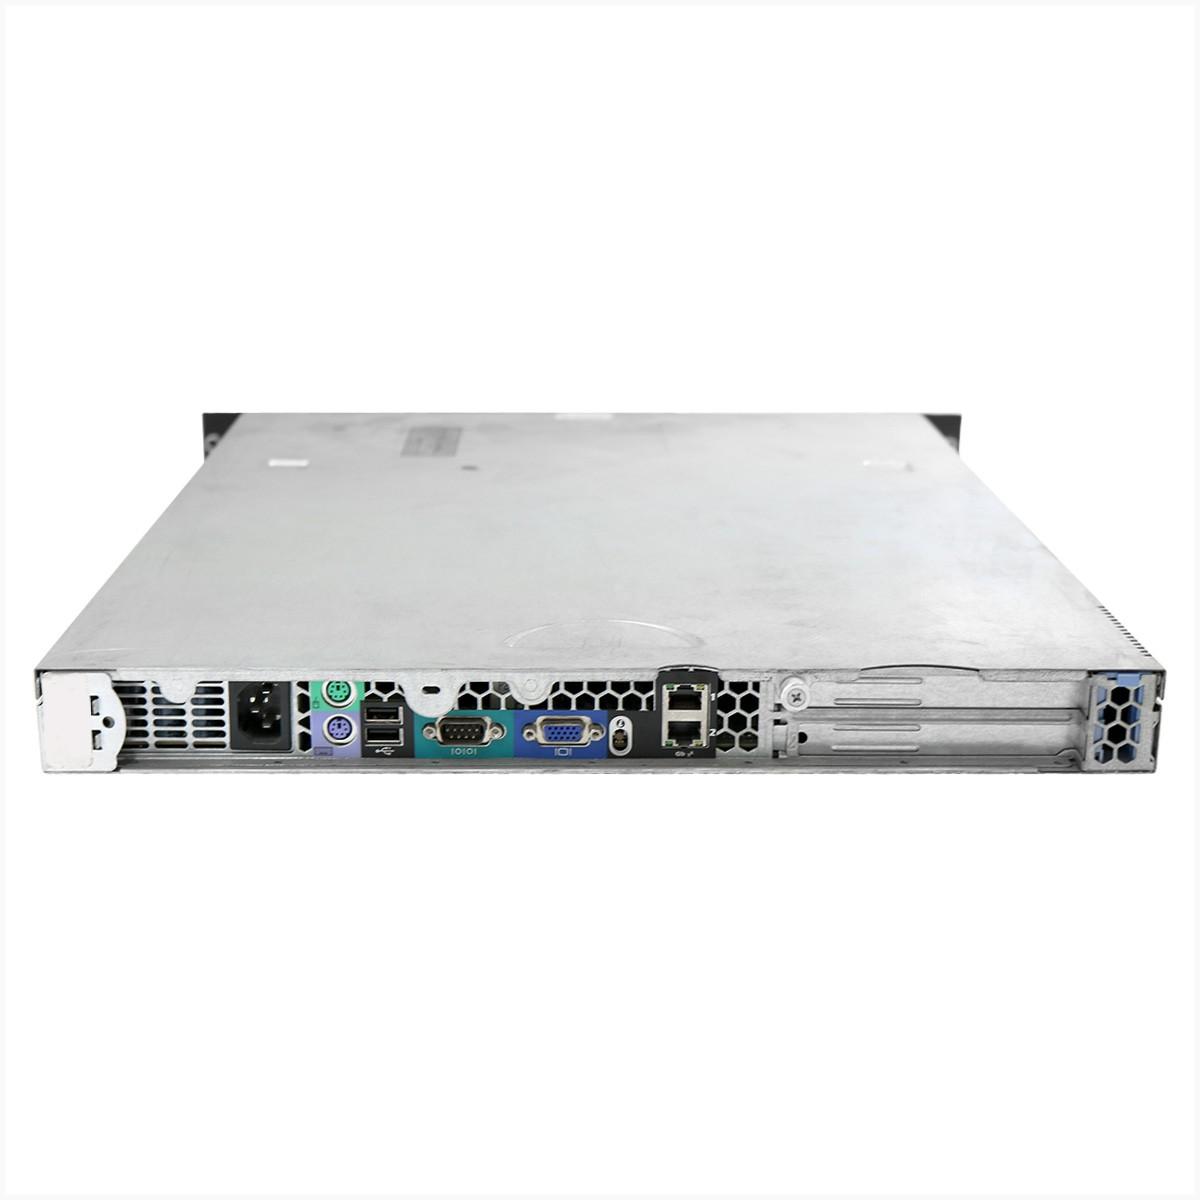 Servidor dell r200 xeon x3220 16gb 1tb - usado